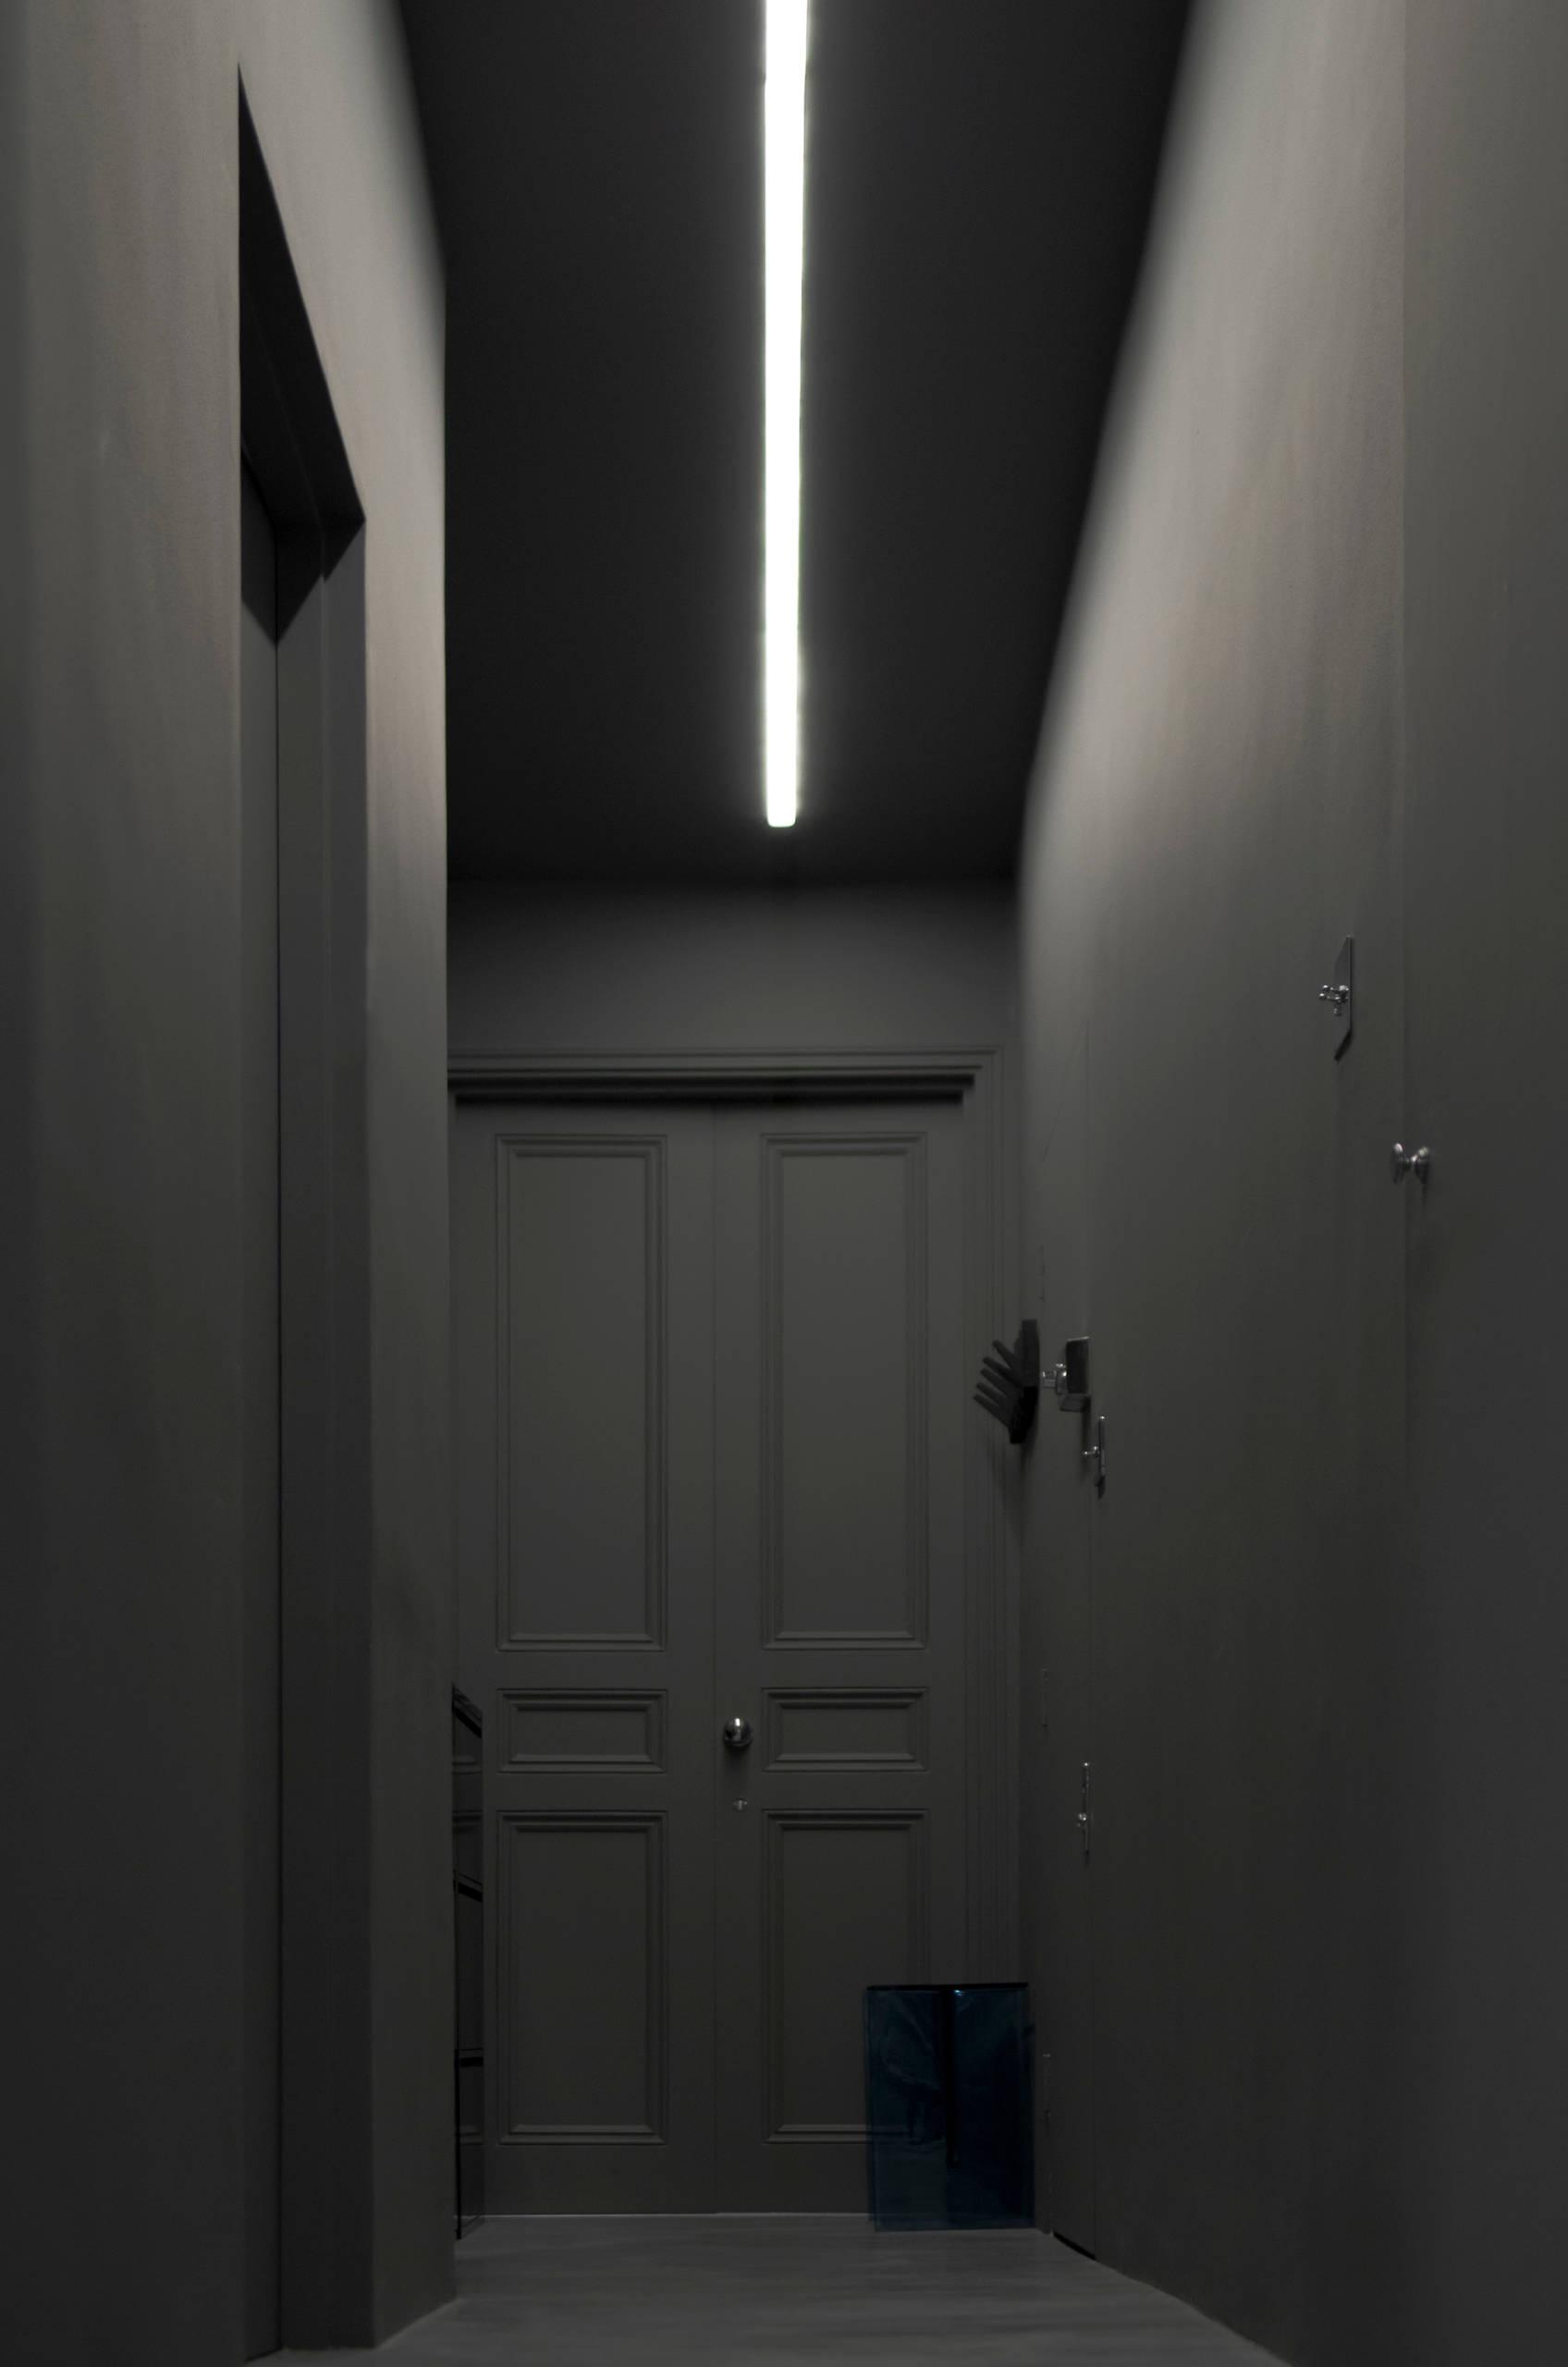 Infinite Hallway